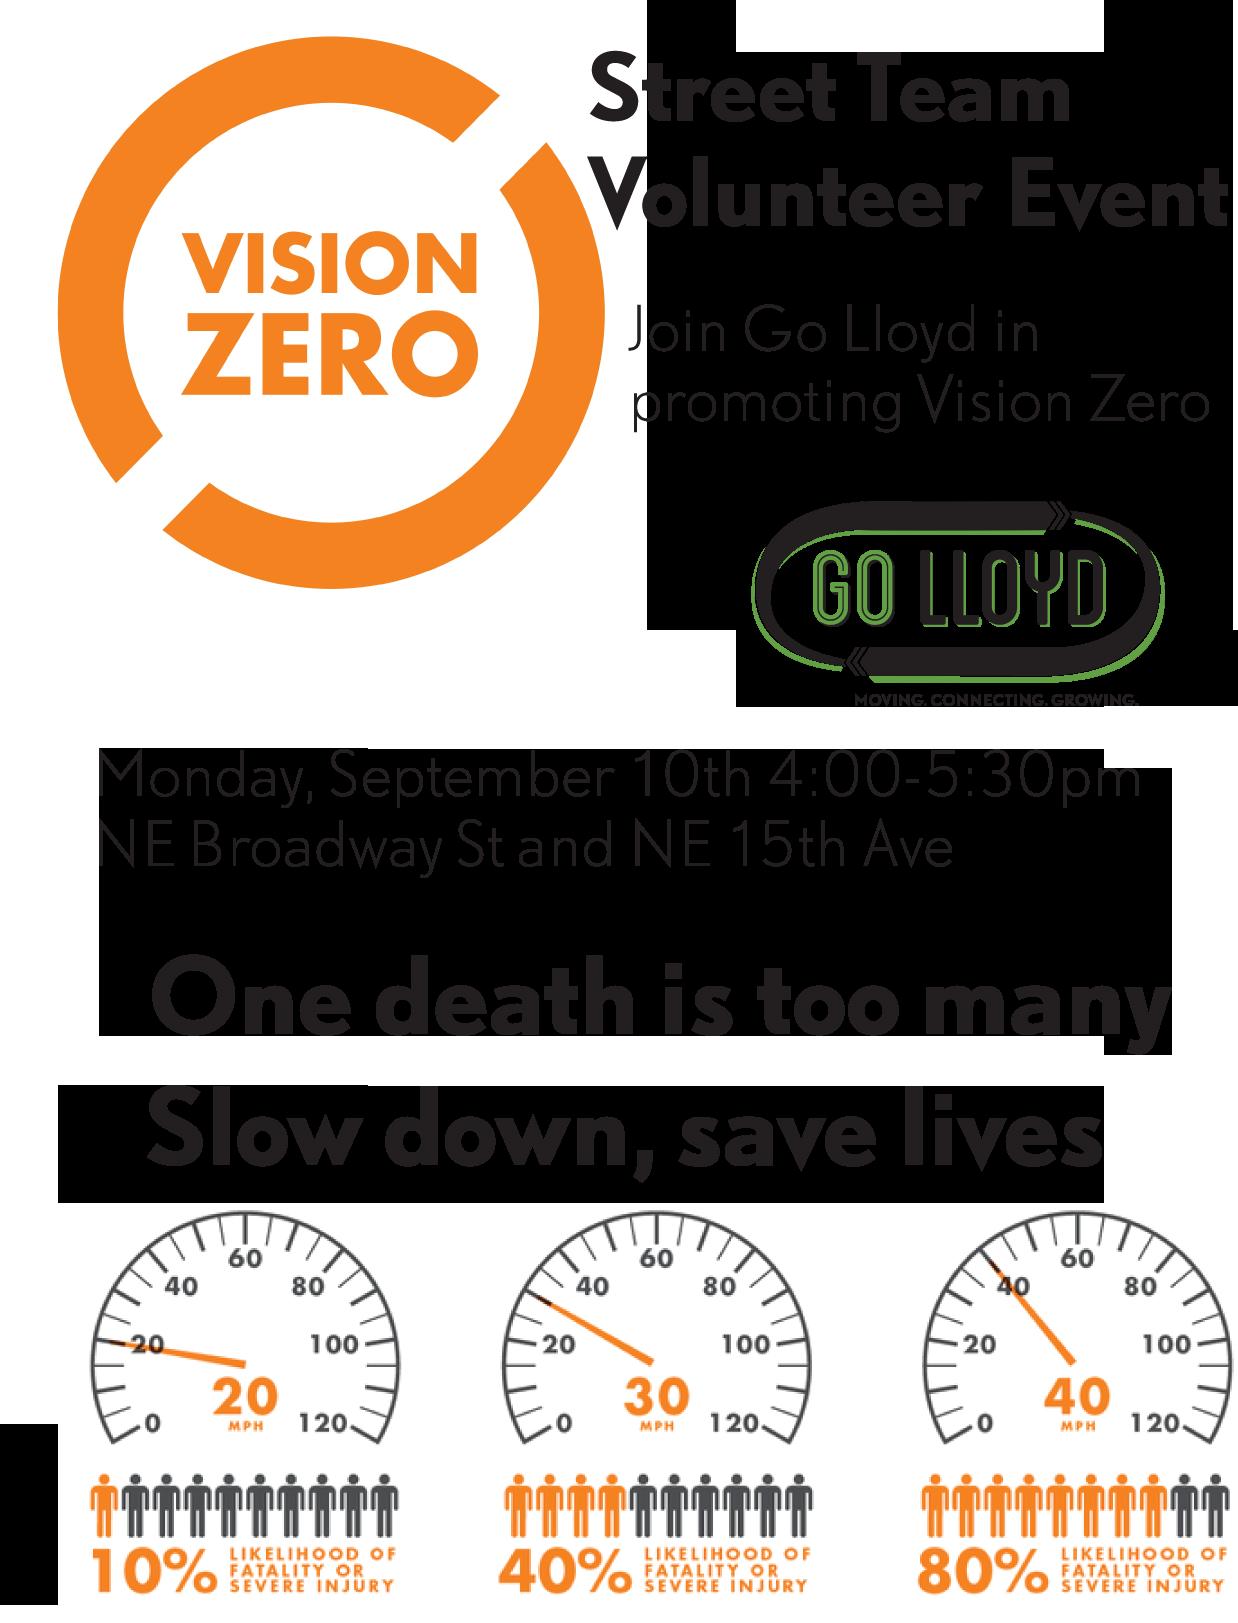 Vision Zero Street Team 5 up September.png